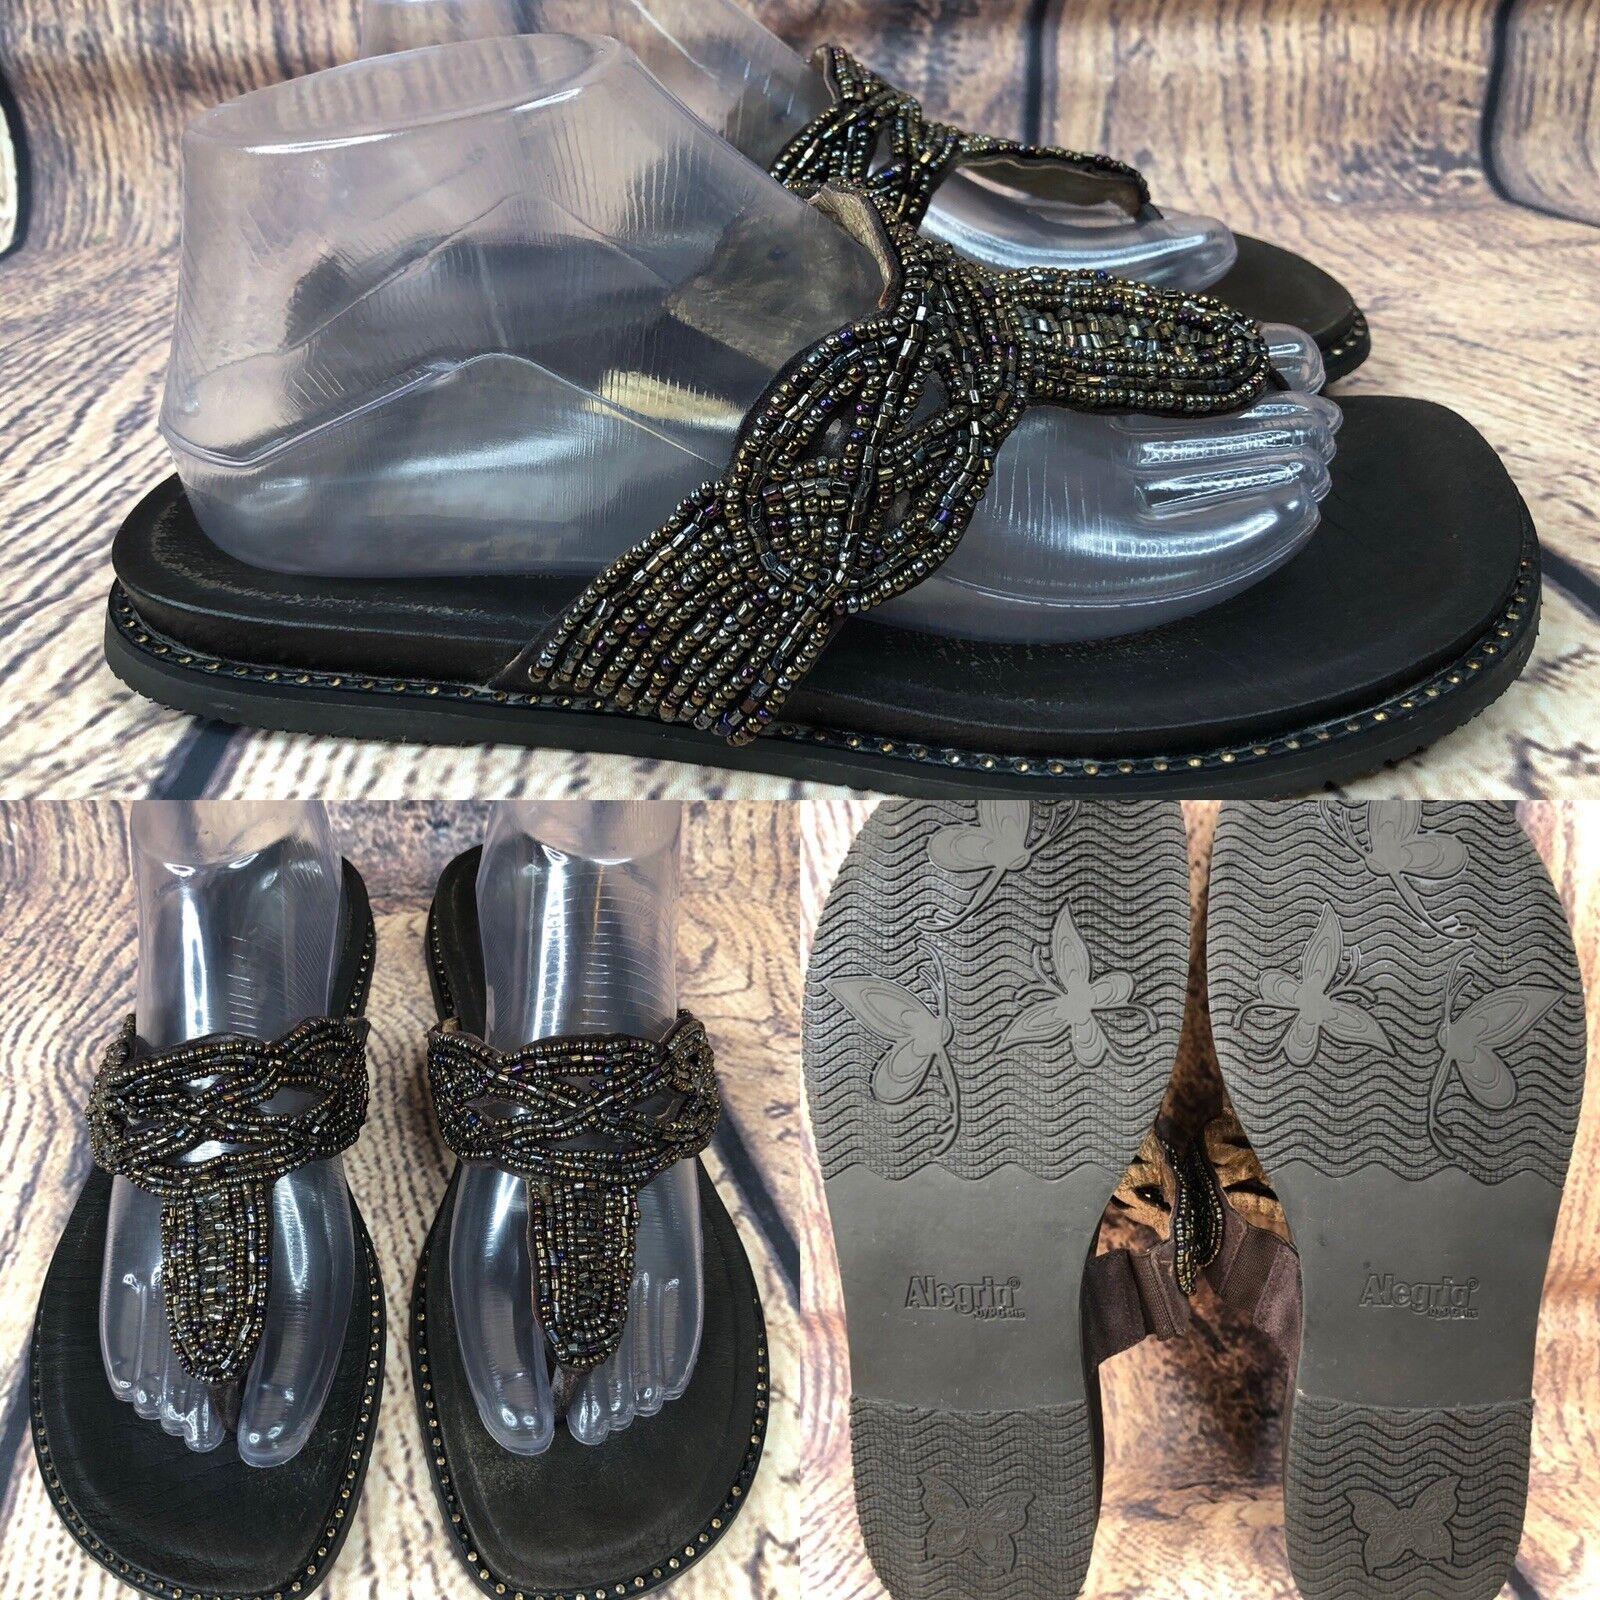 Womens ALEGRIA TAN-201 'Tangoh' Brown Beaded Thong Sandals SIZE 40 US 9.5-10